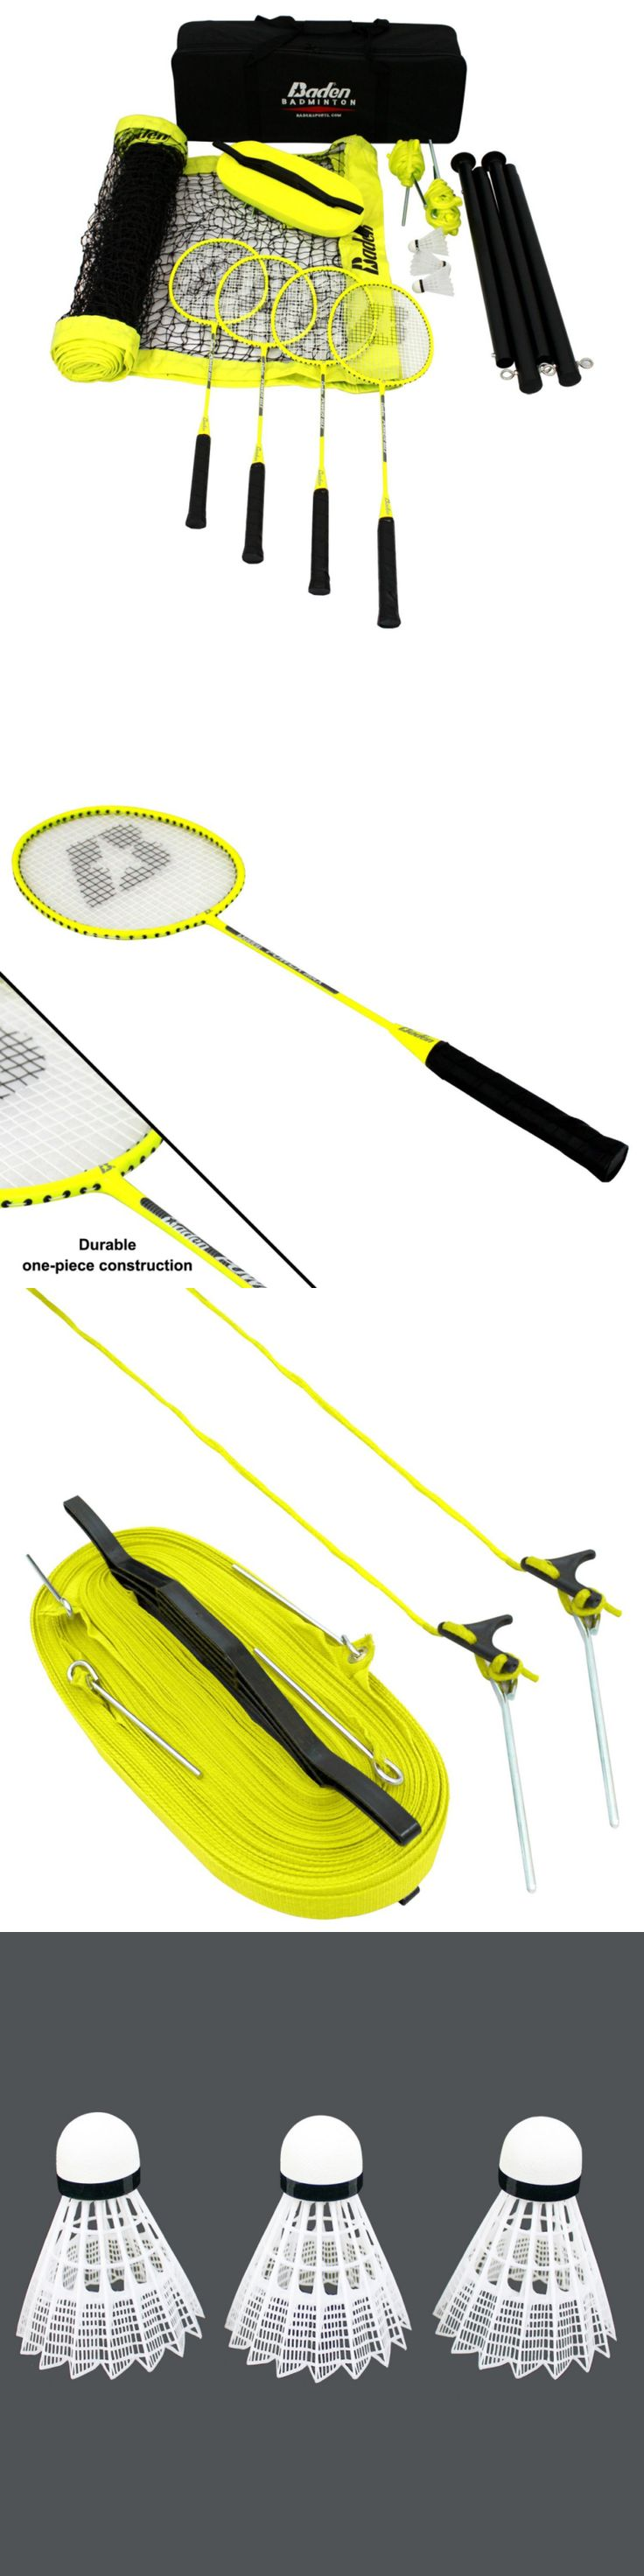 Badminton 106460: Baden Champions Series Badminton Set -> BUY IT NOW ONLY: $121.99 on eBay!